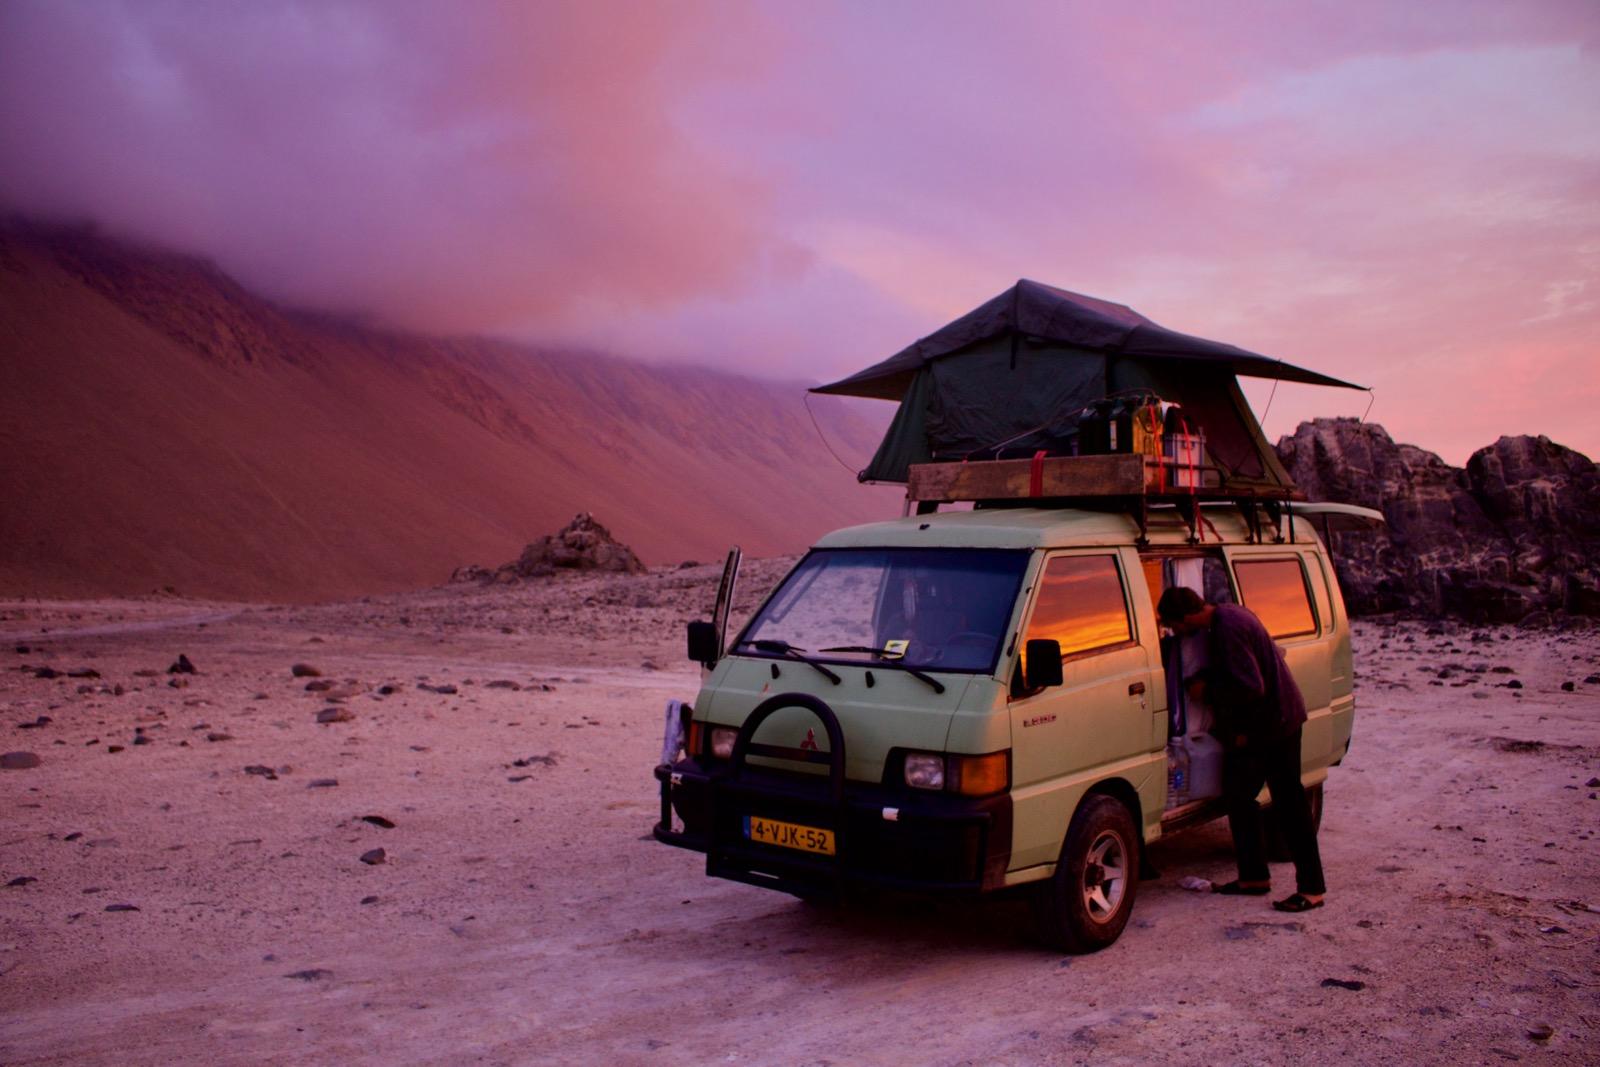 campervan conversion in-action shots - 6.jpg